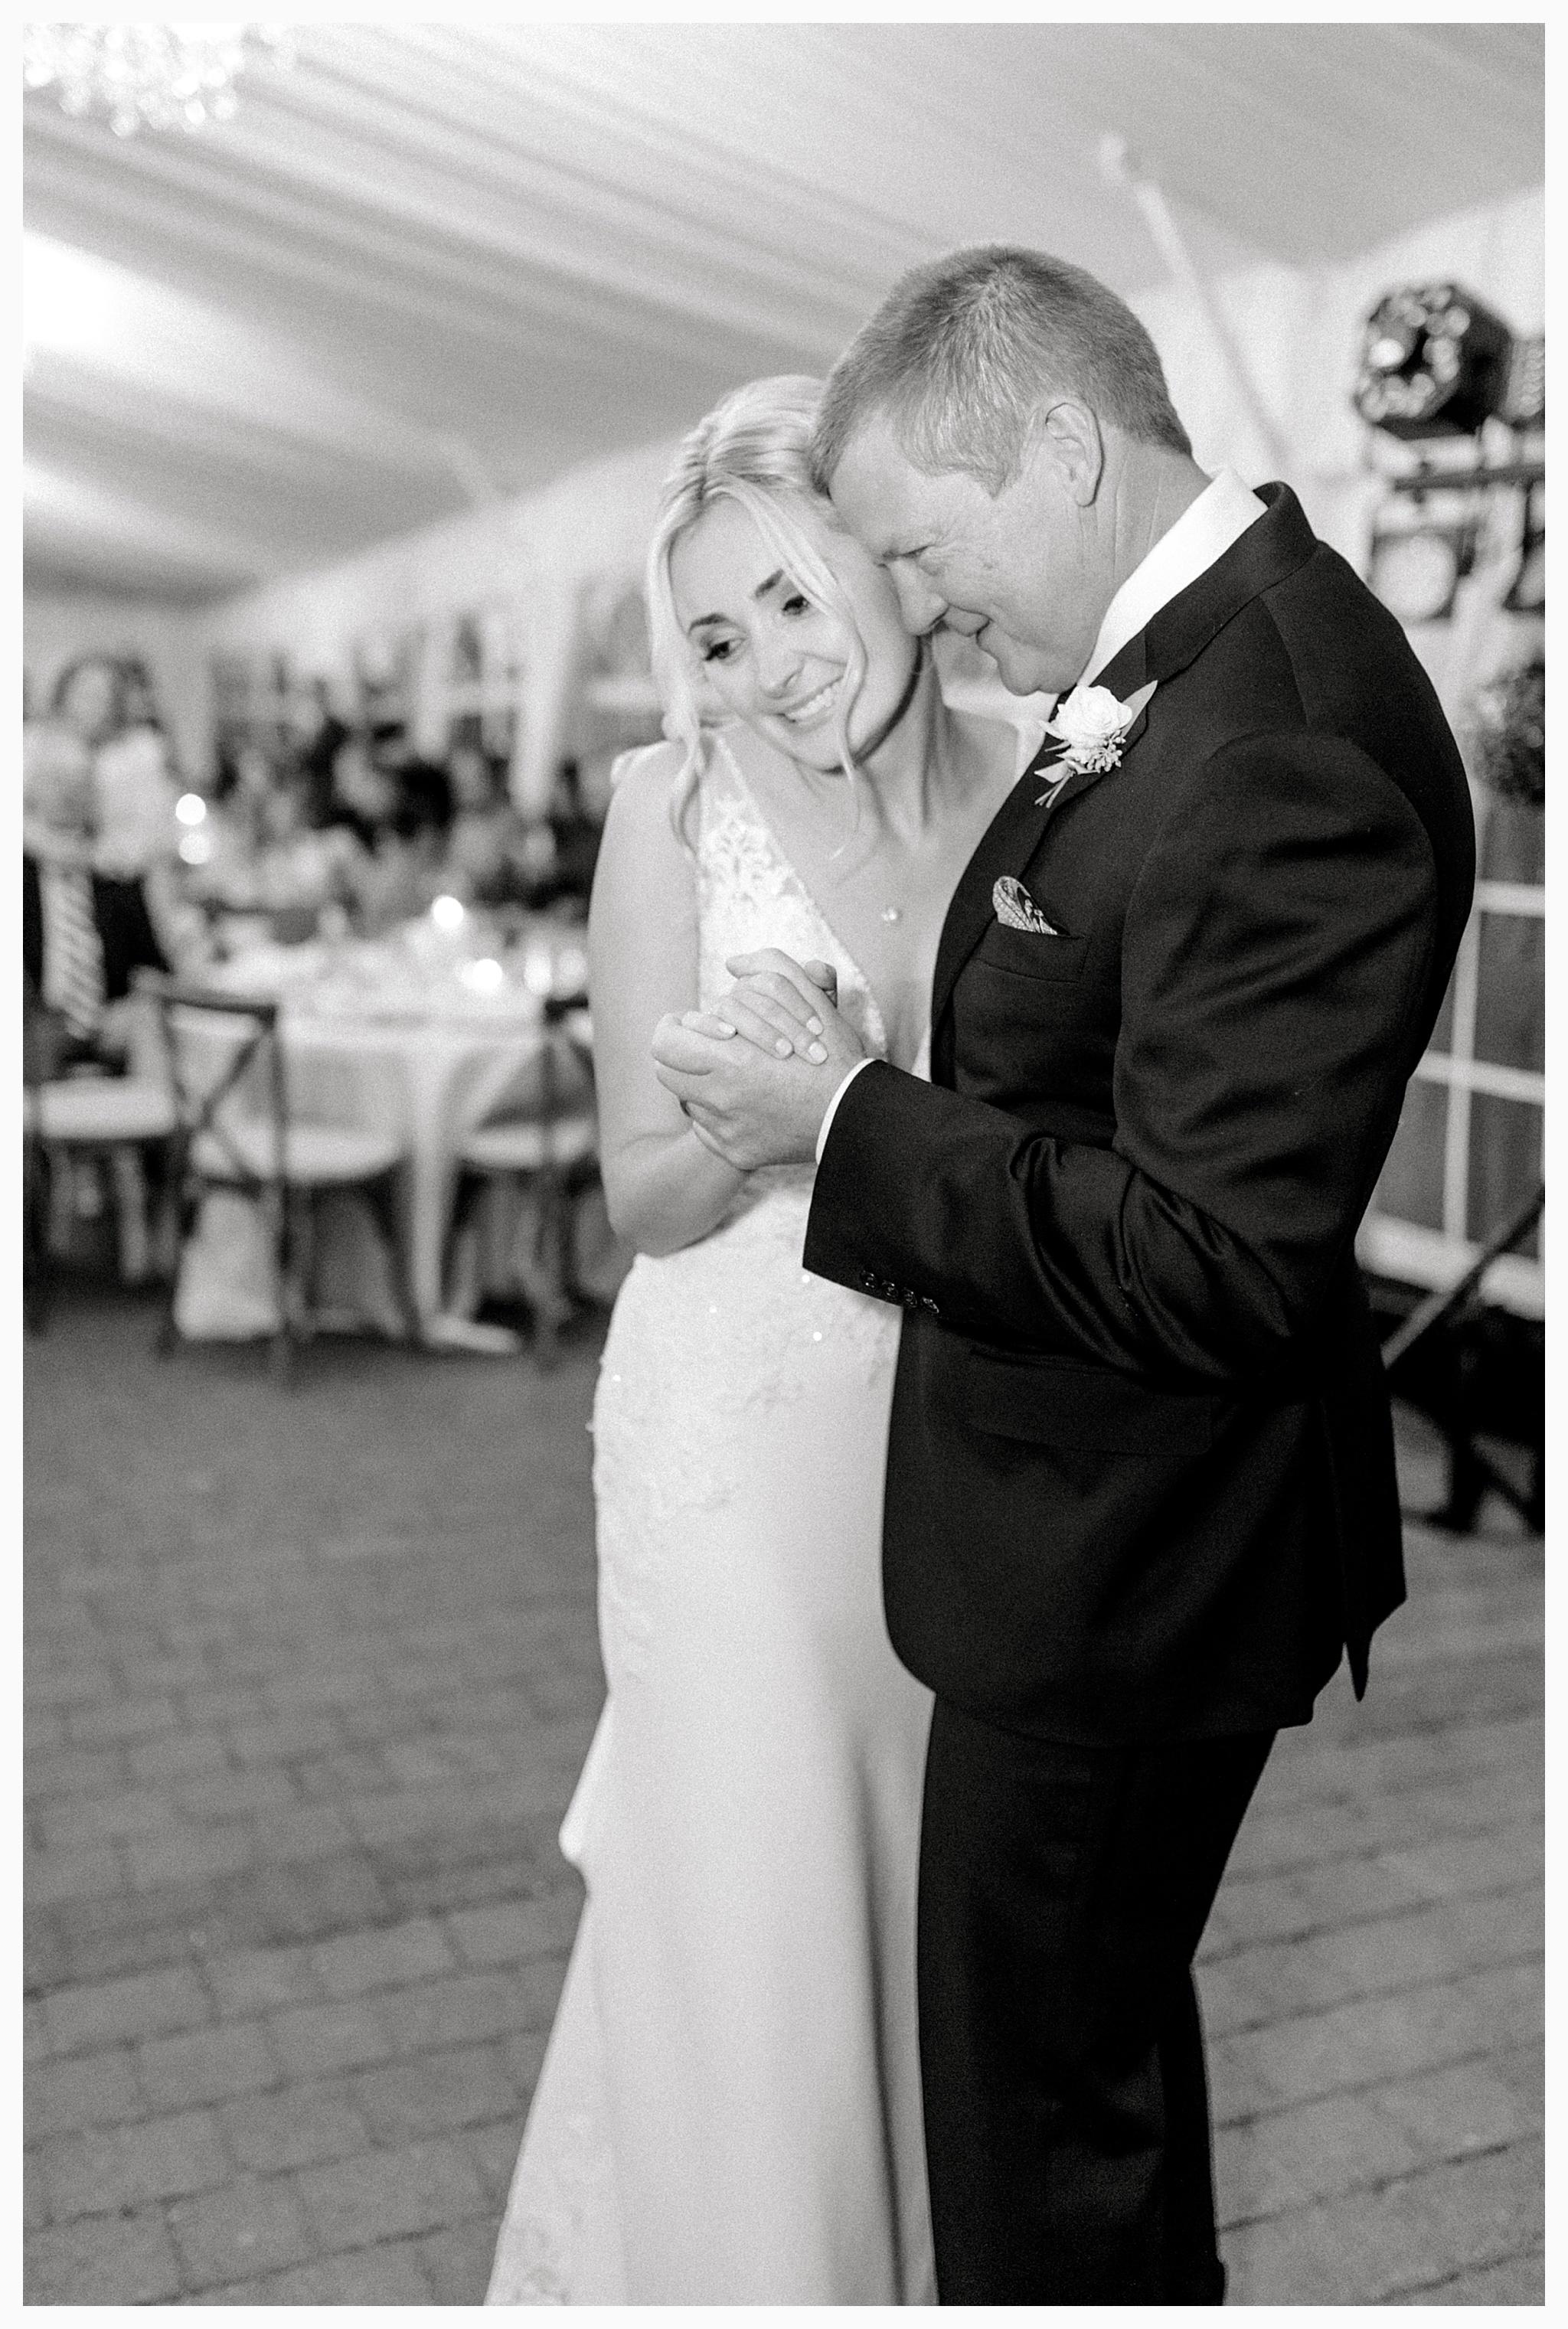 Emma Rose Company Light and Airy Wedding Photographer, Beautiful fall wedding at Rock Creek Gardens Venue in Puyallup, Washington._0112.jpg